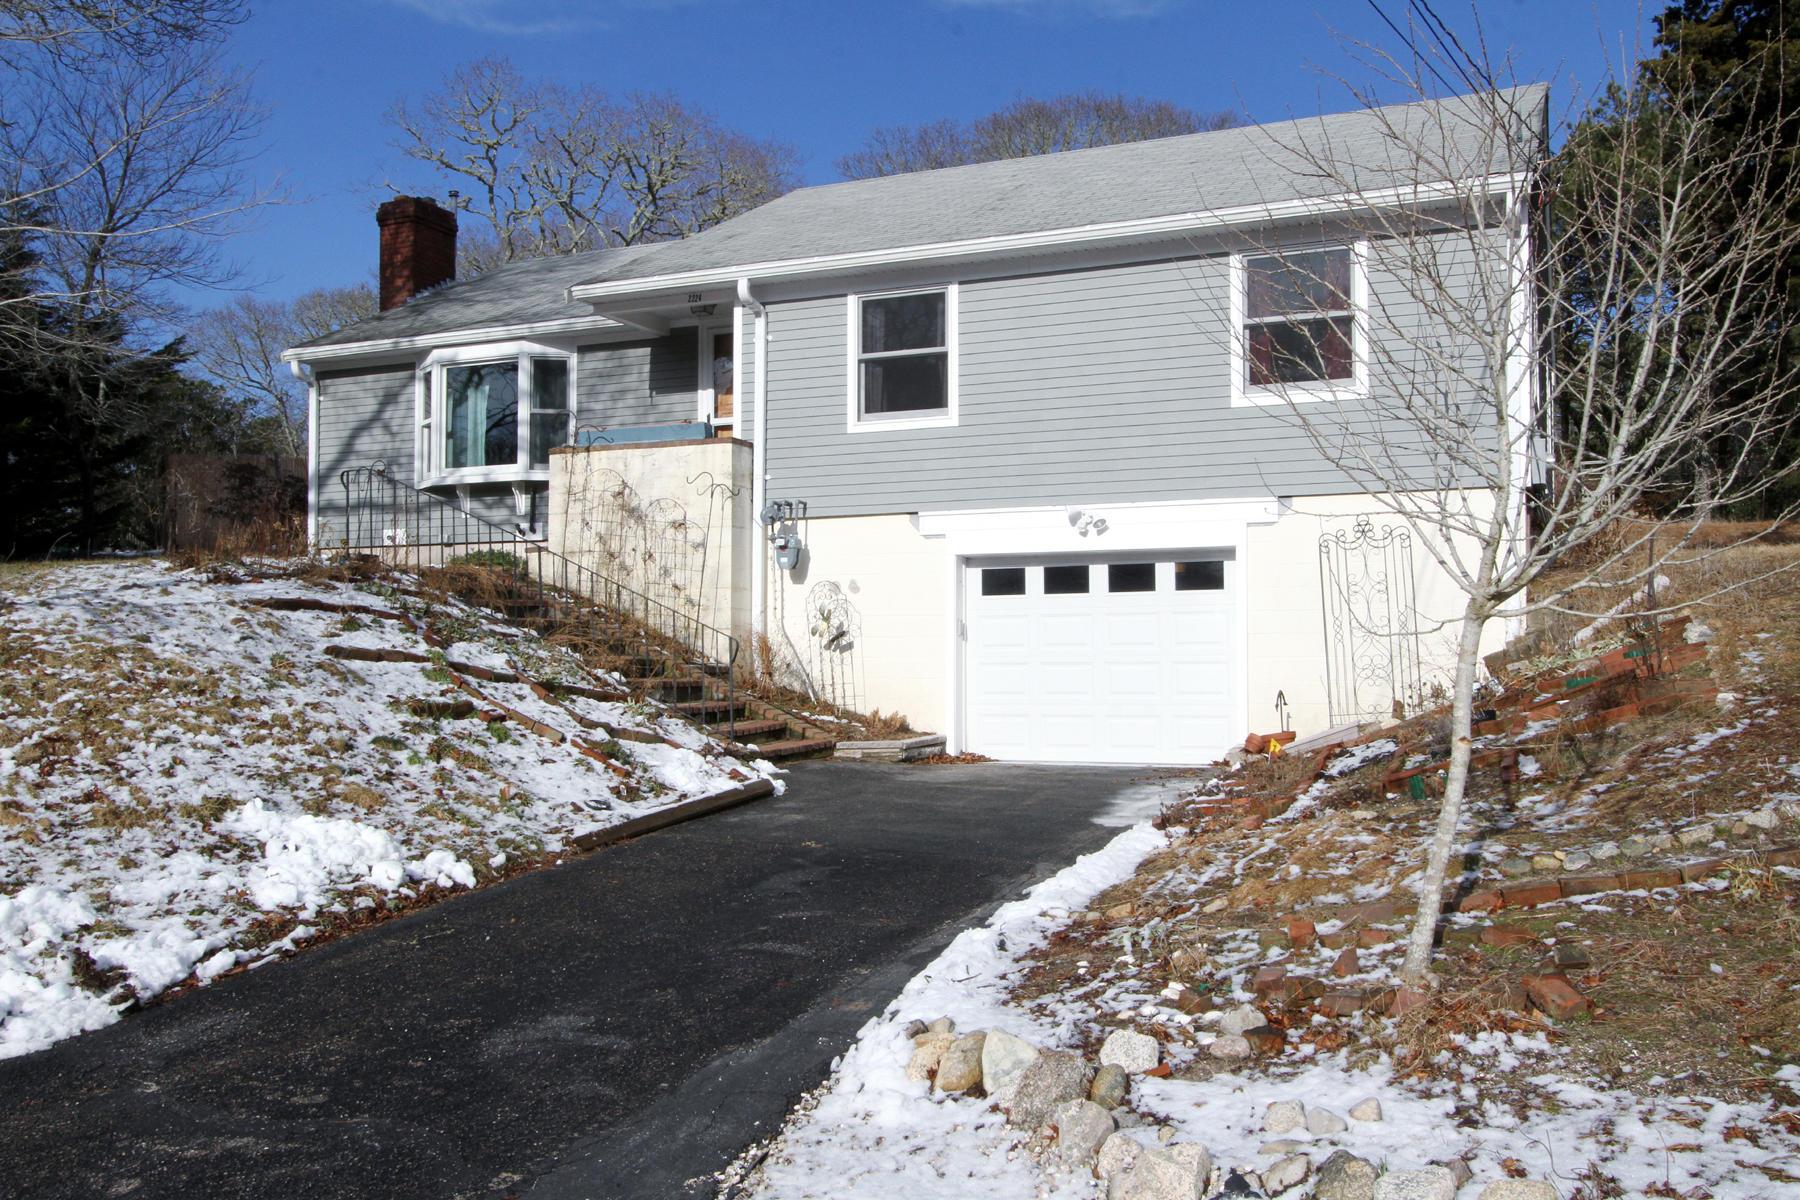 Casa Unifamiliar por un Venta en 2224 Main Street, Chatham, MA Chatham, Massachusetts, 02633 Estados Unidos